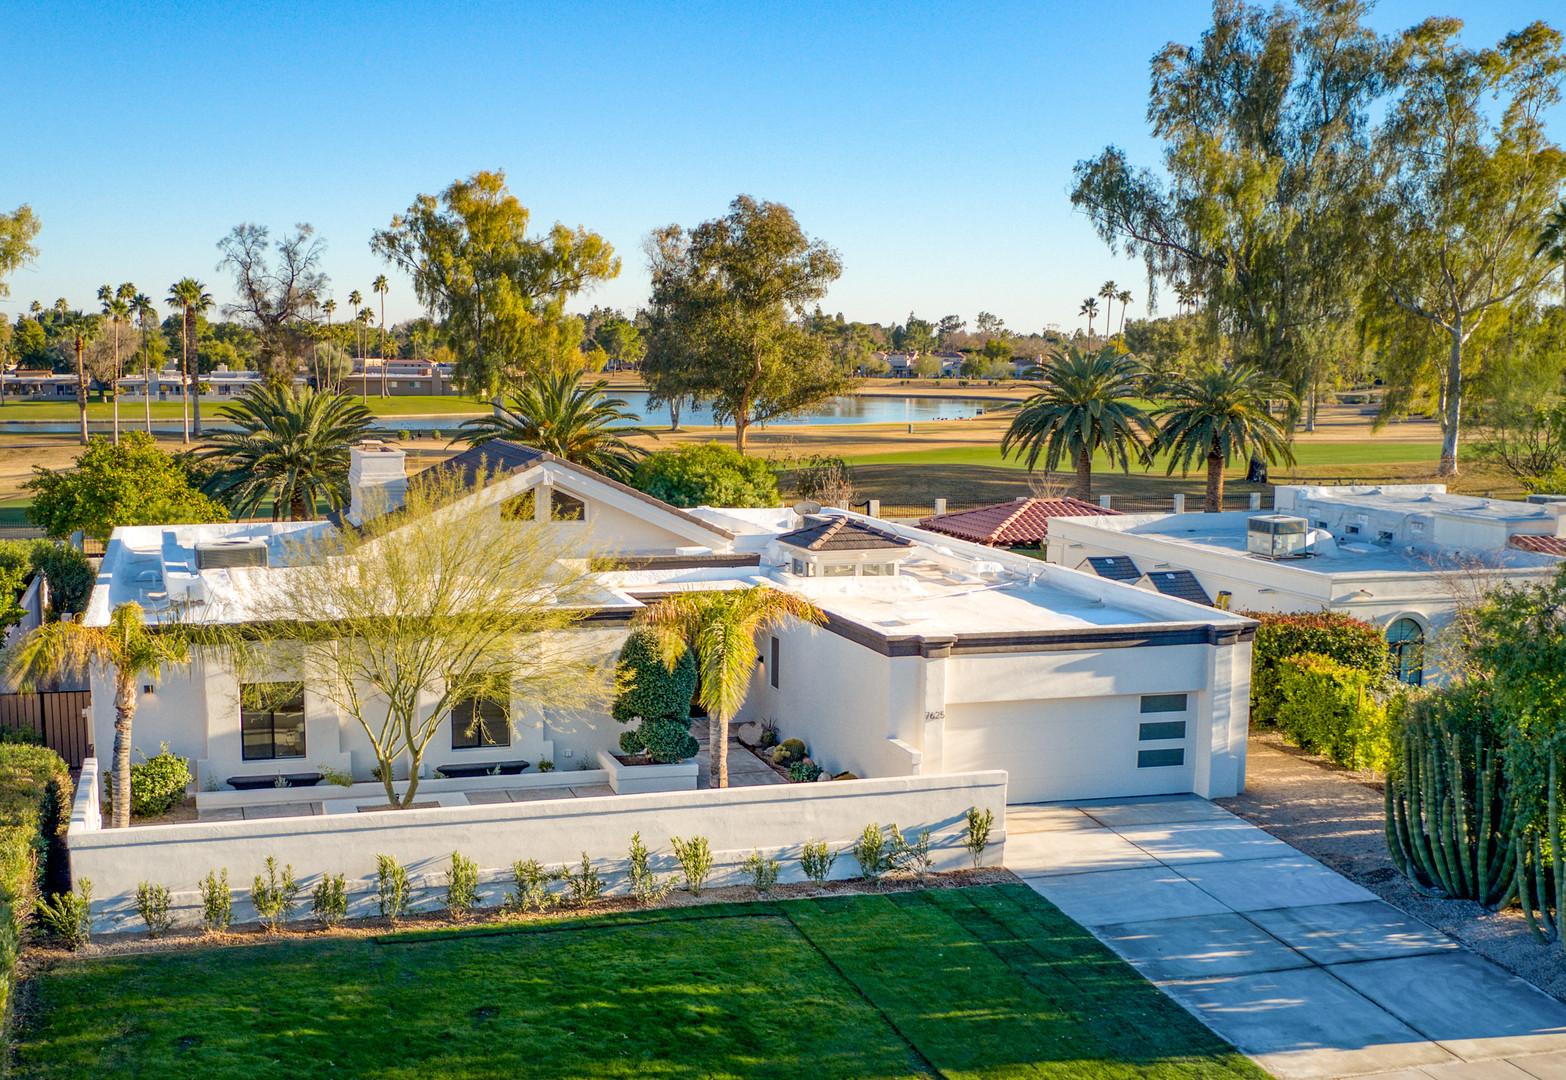 Drone Photography Arizona